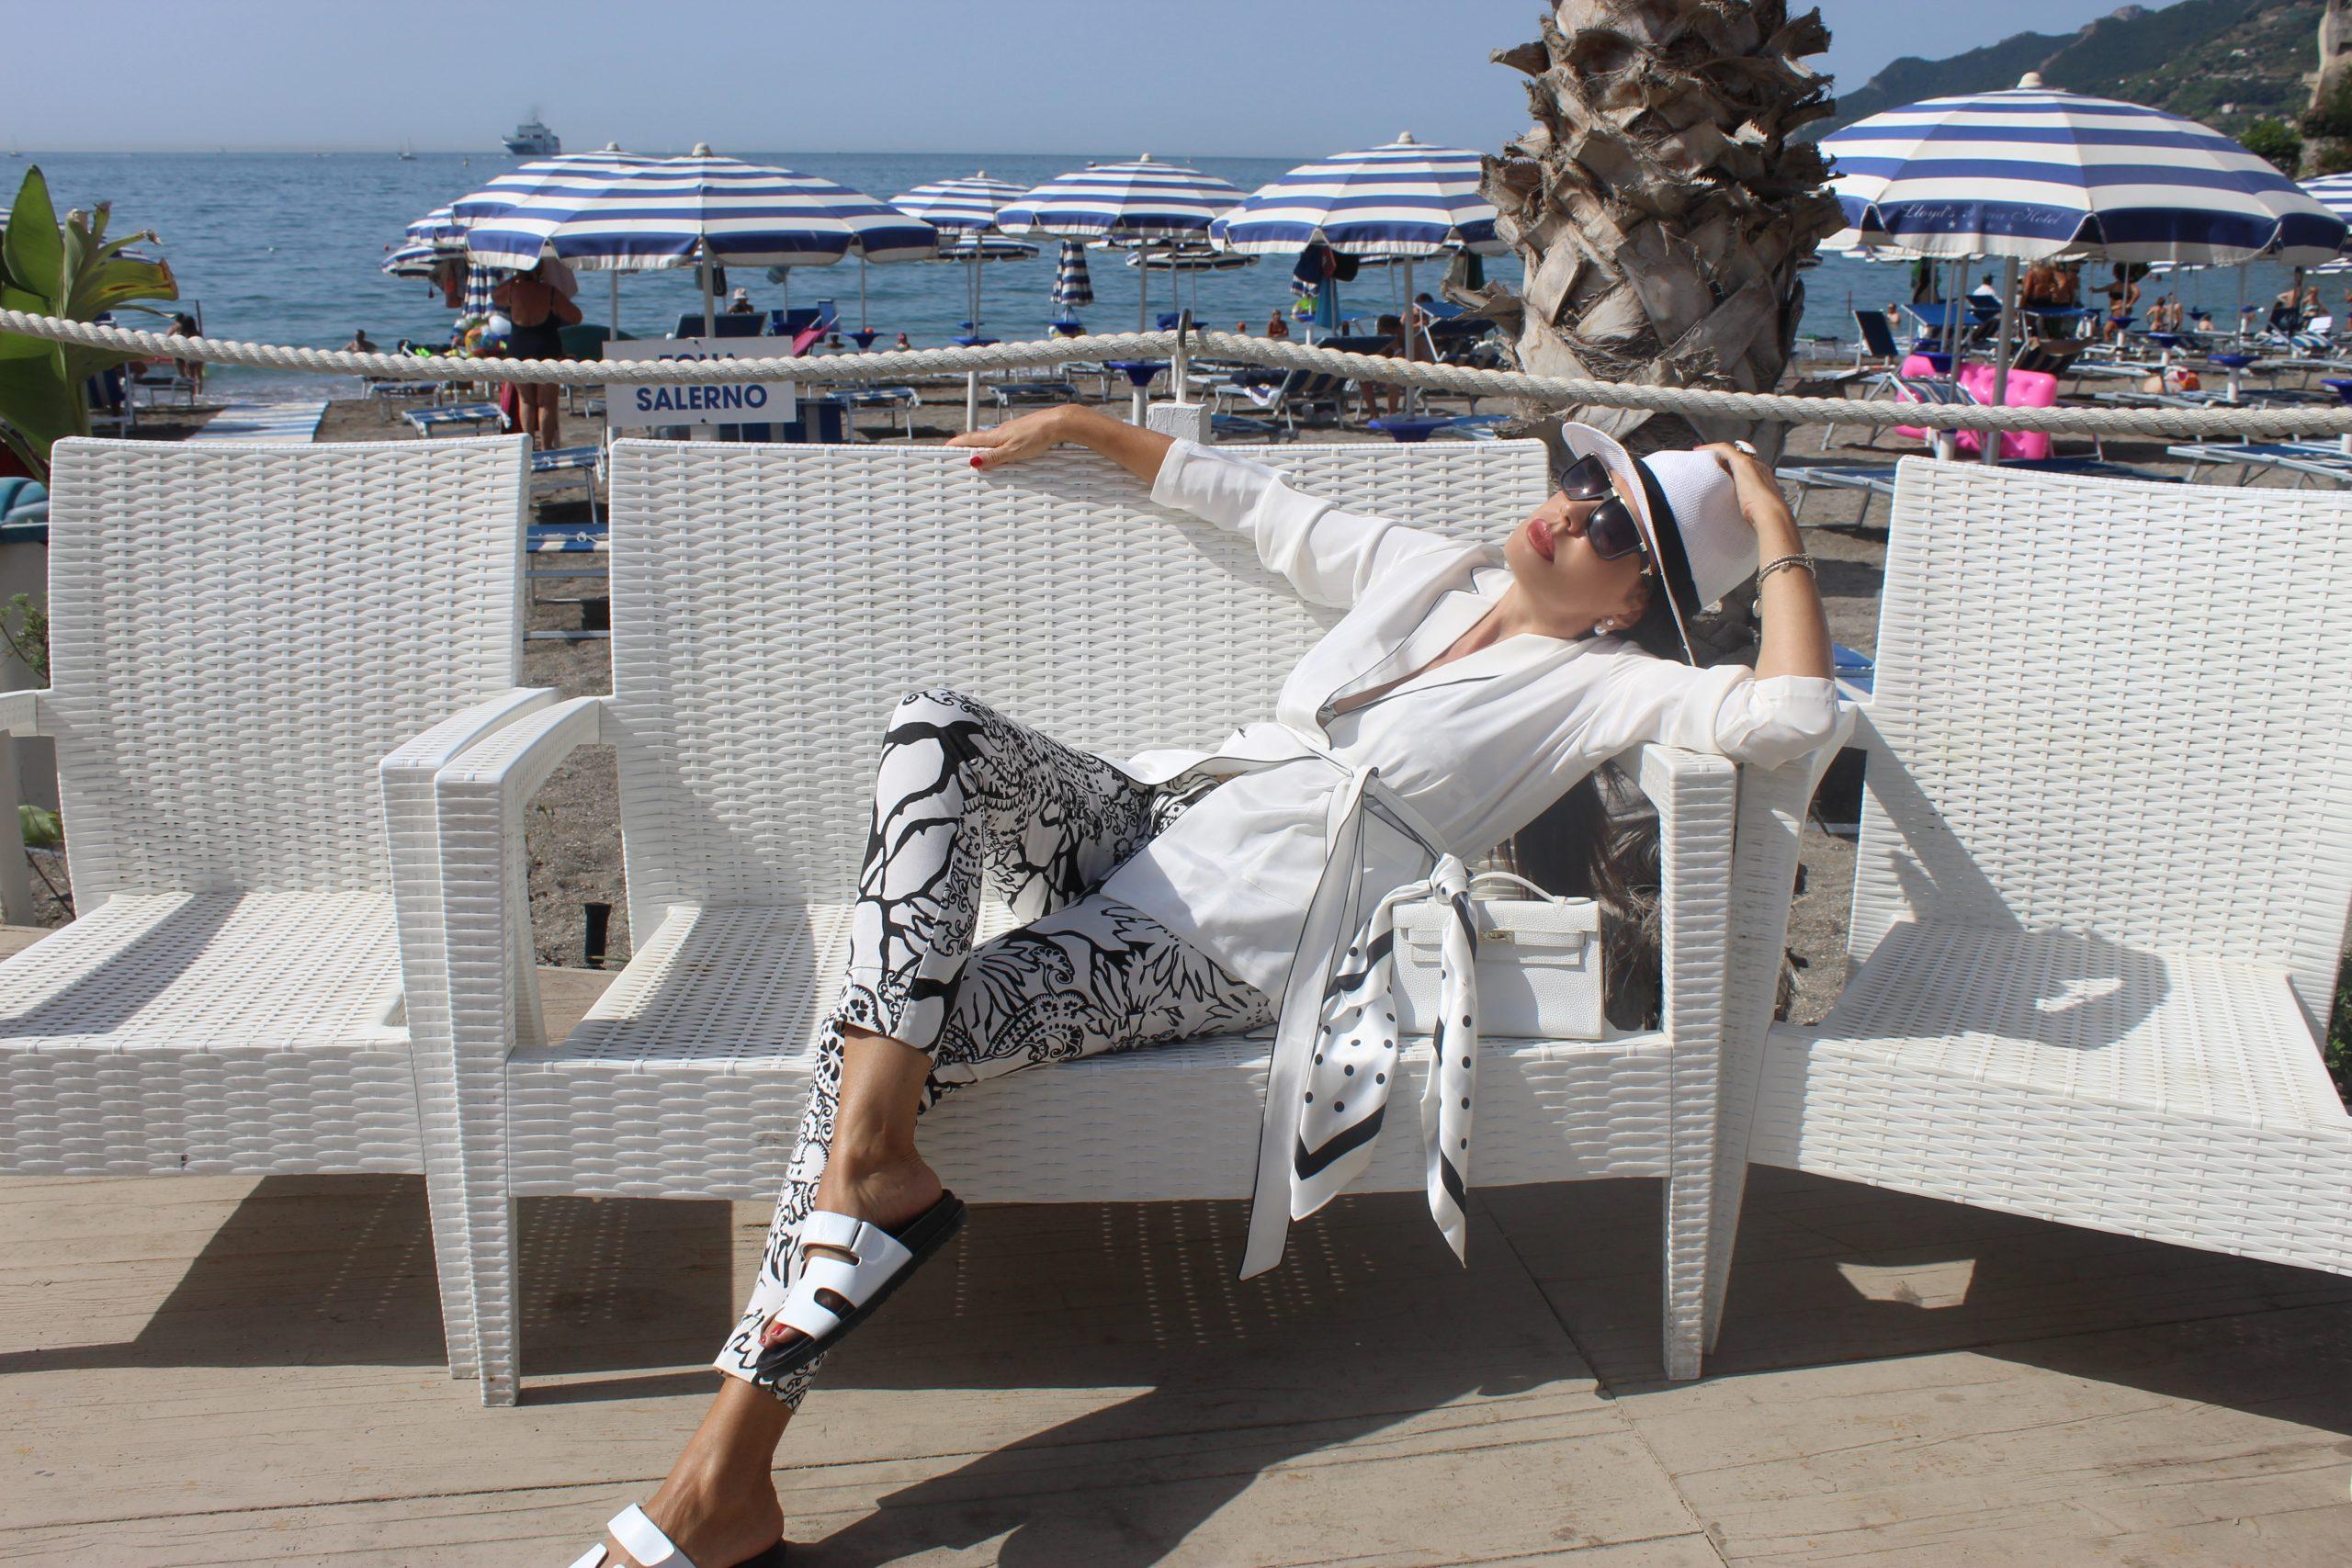 Summer Italian Staycation White Silk Outfit Beachwear LilySilk Look Hermes Details